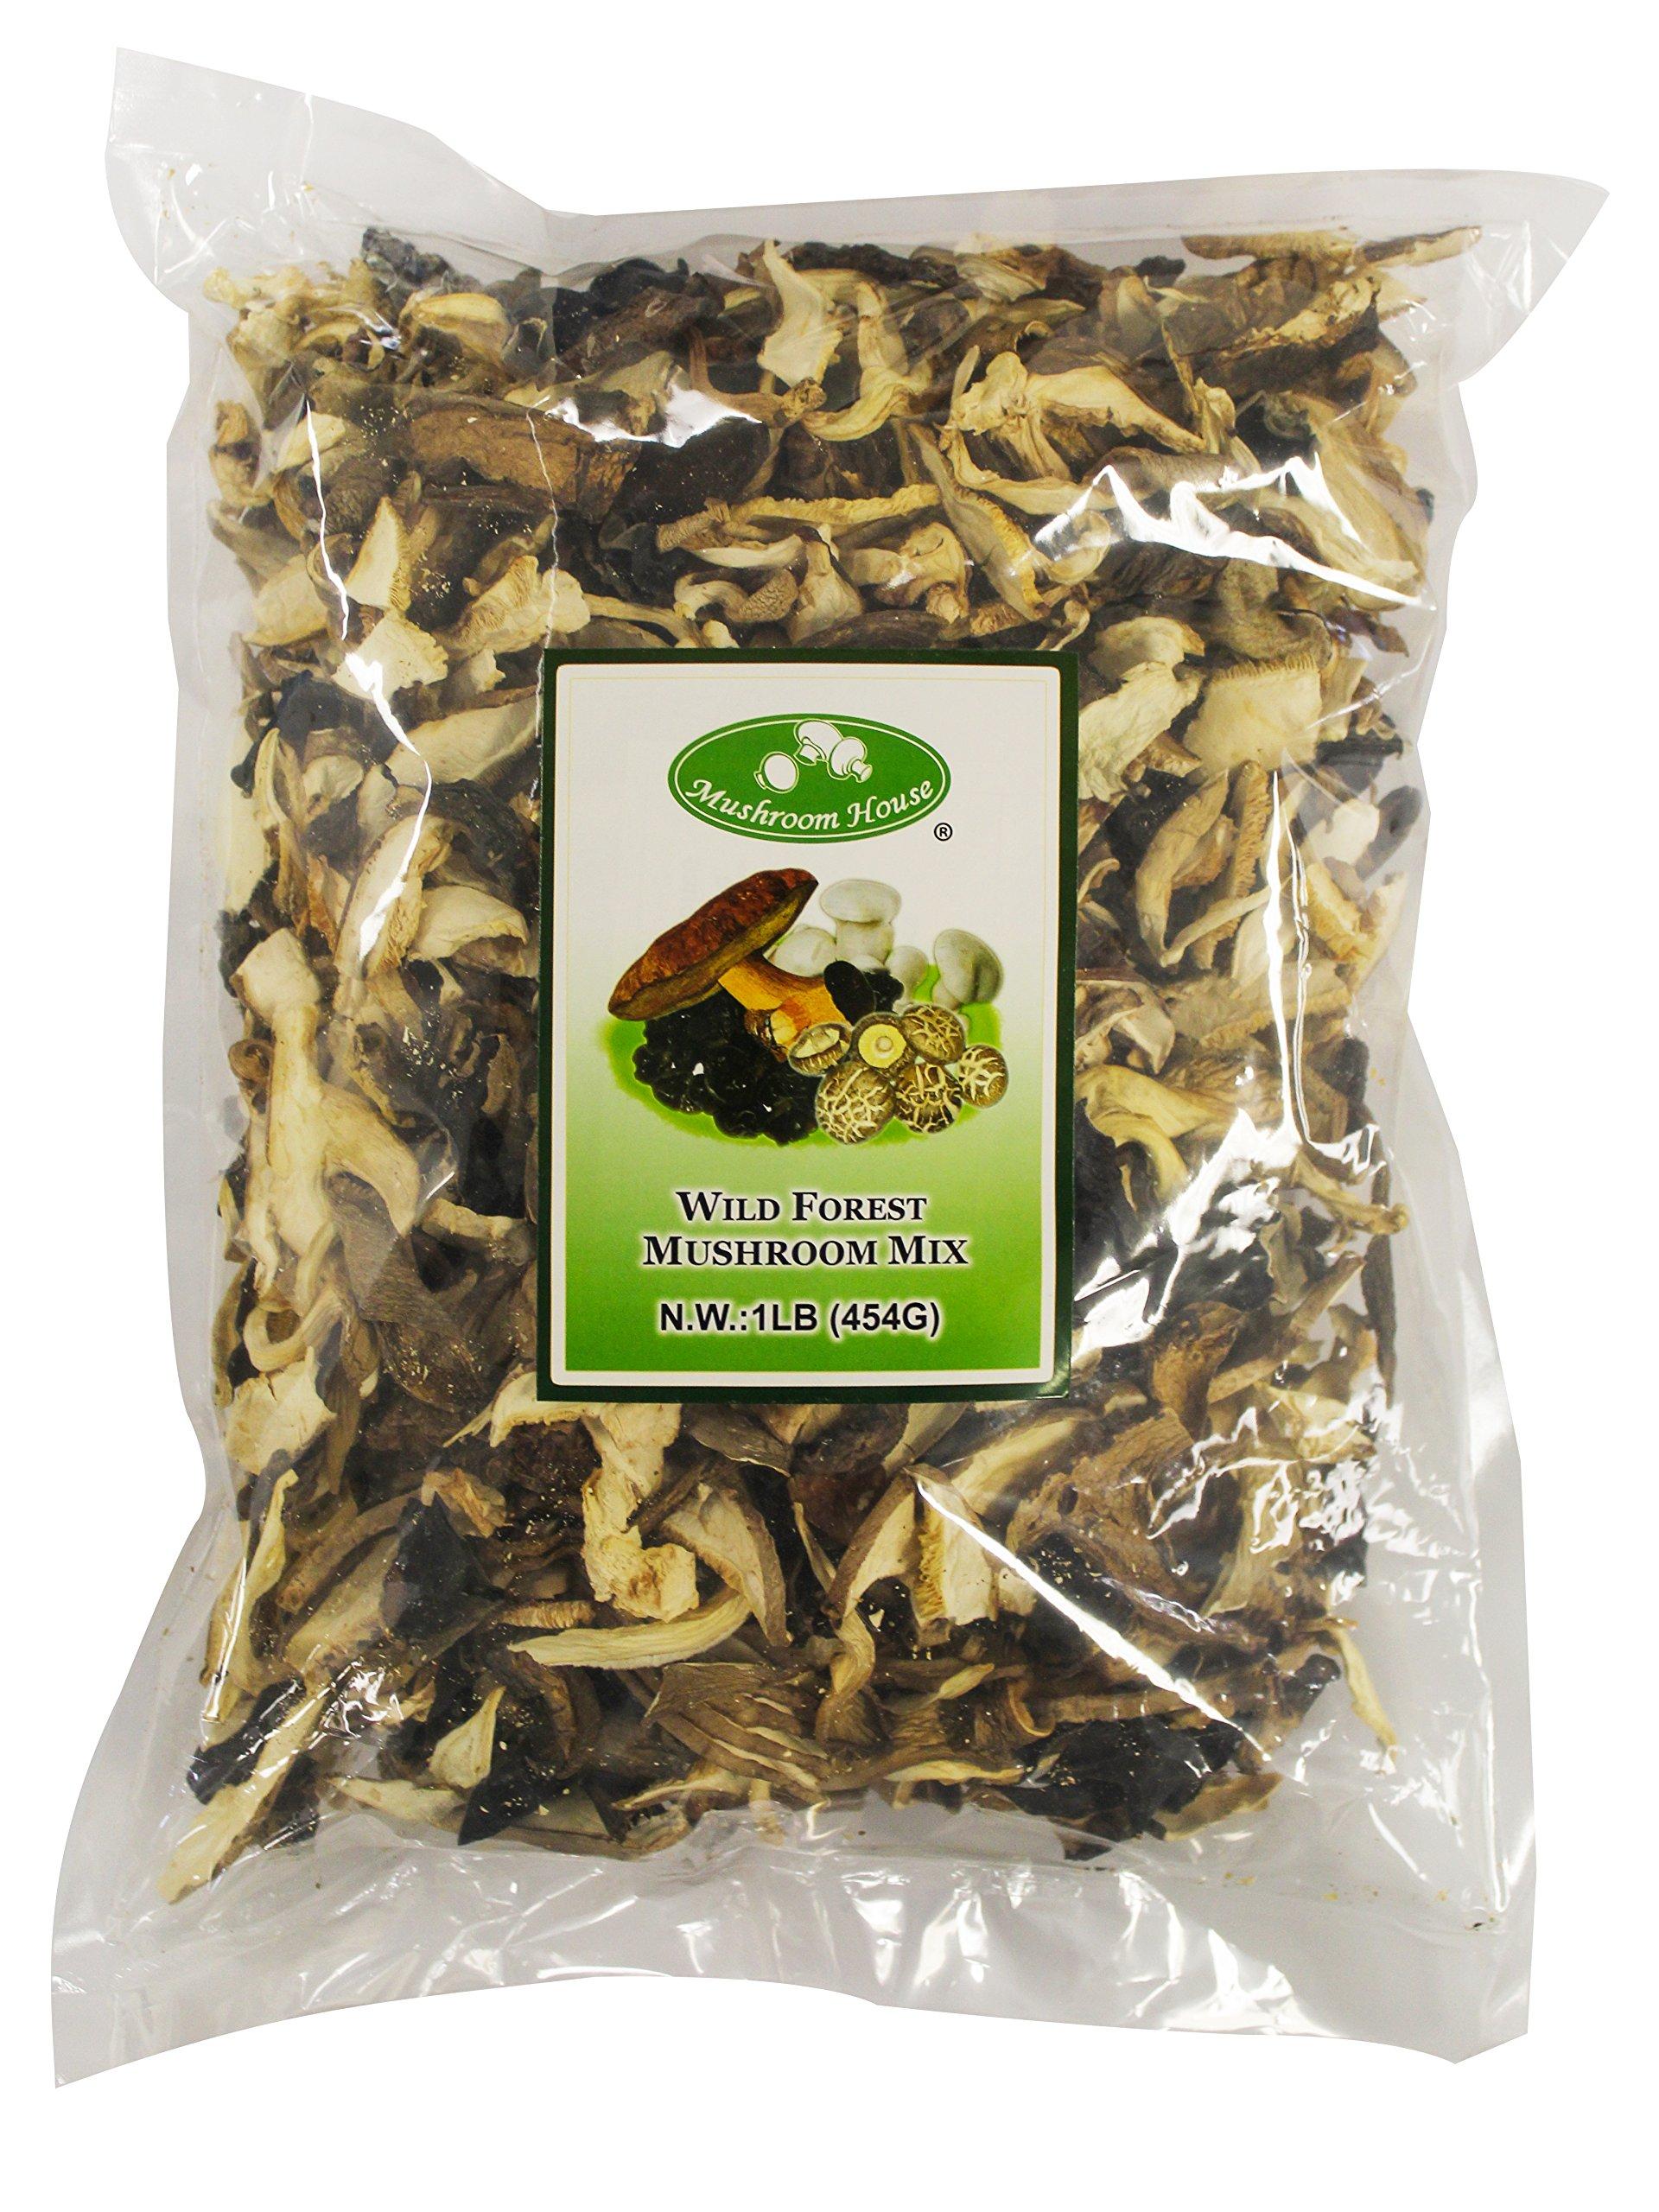 Amazon Mushroom House Dried Shiitake Mushroom Slices 1